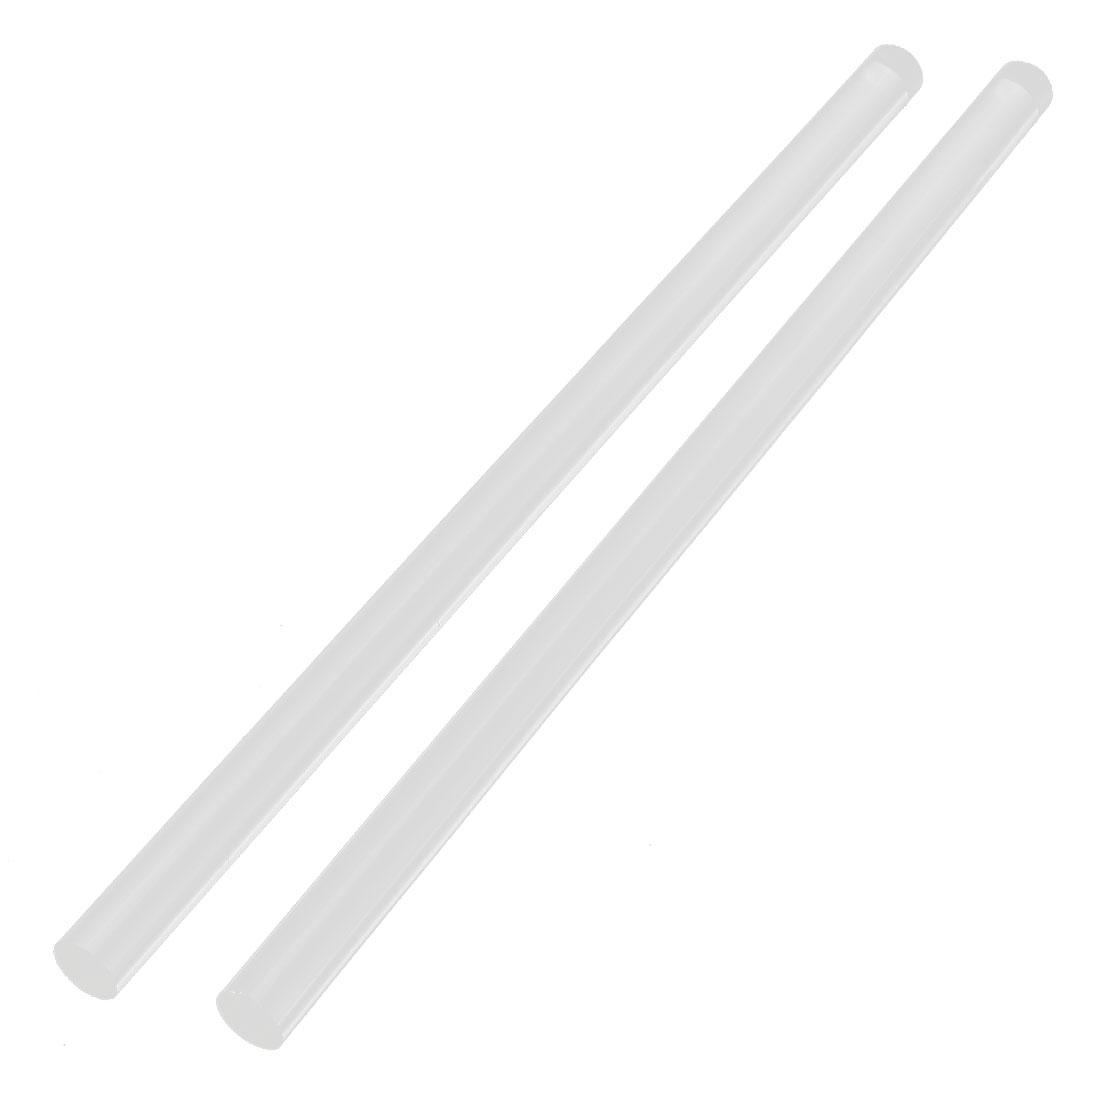 "2Pcs 14mm Dia Clear Round Acrylic Rod PMMA Circular Bar 12"" Length"